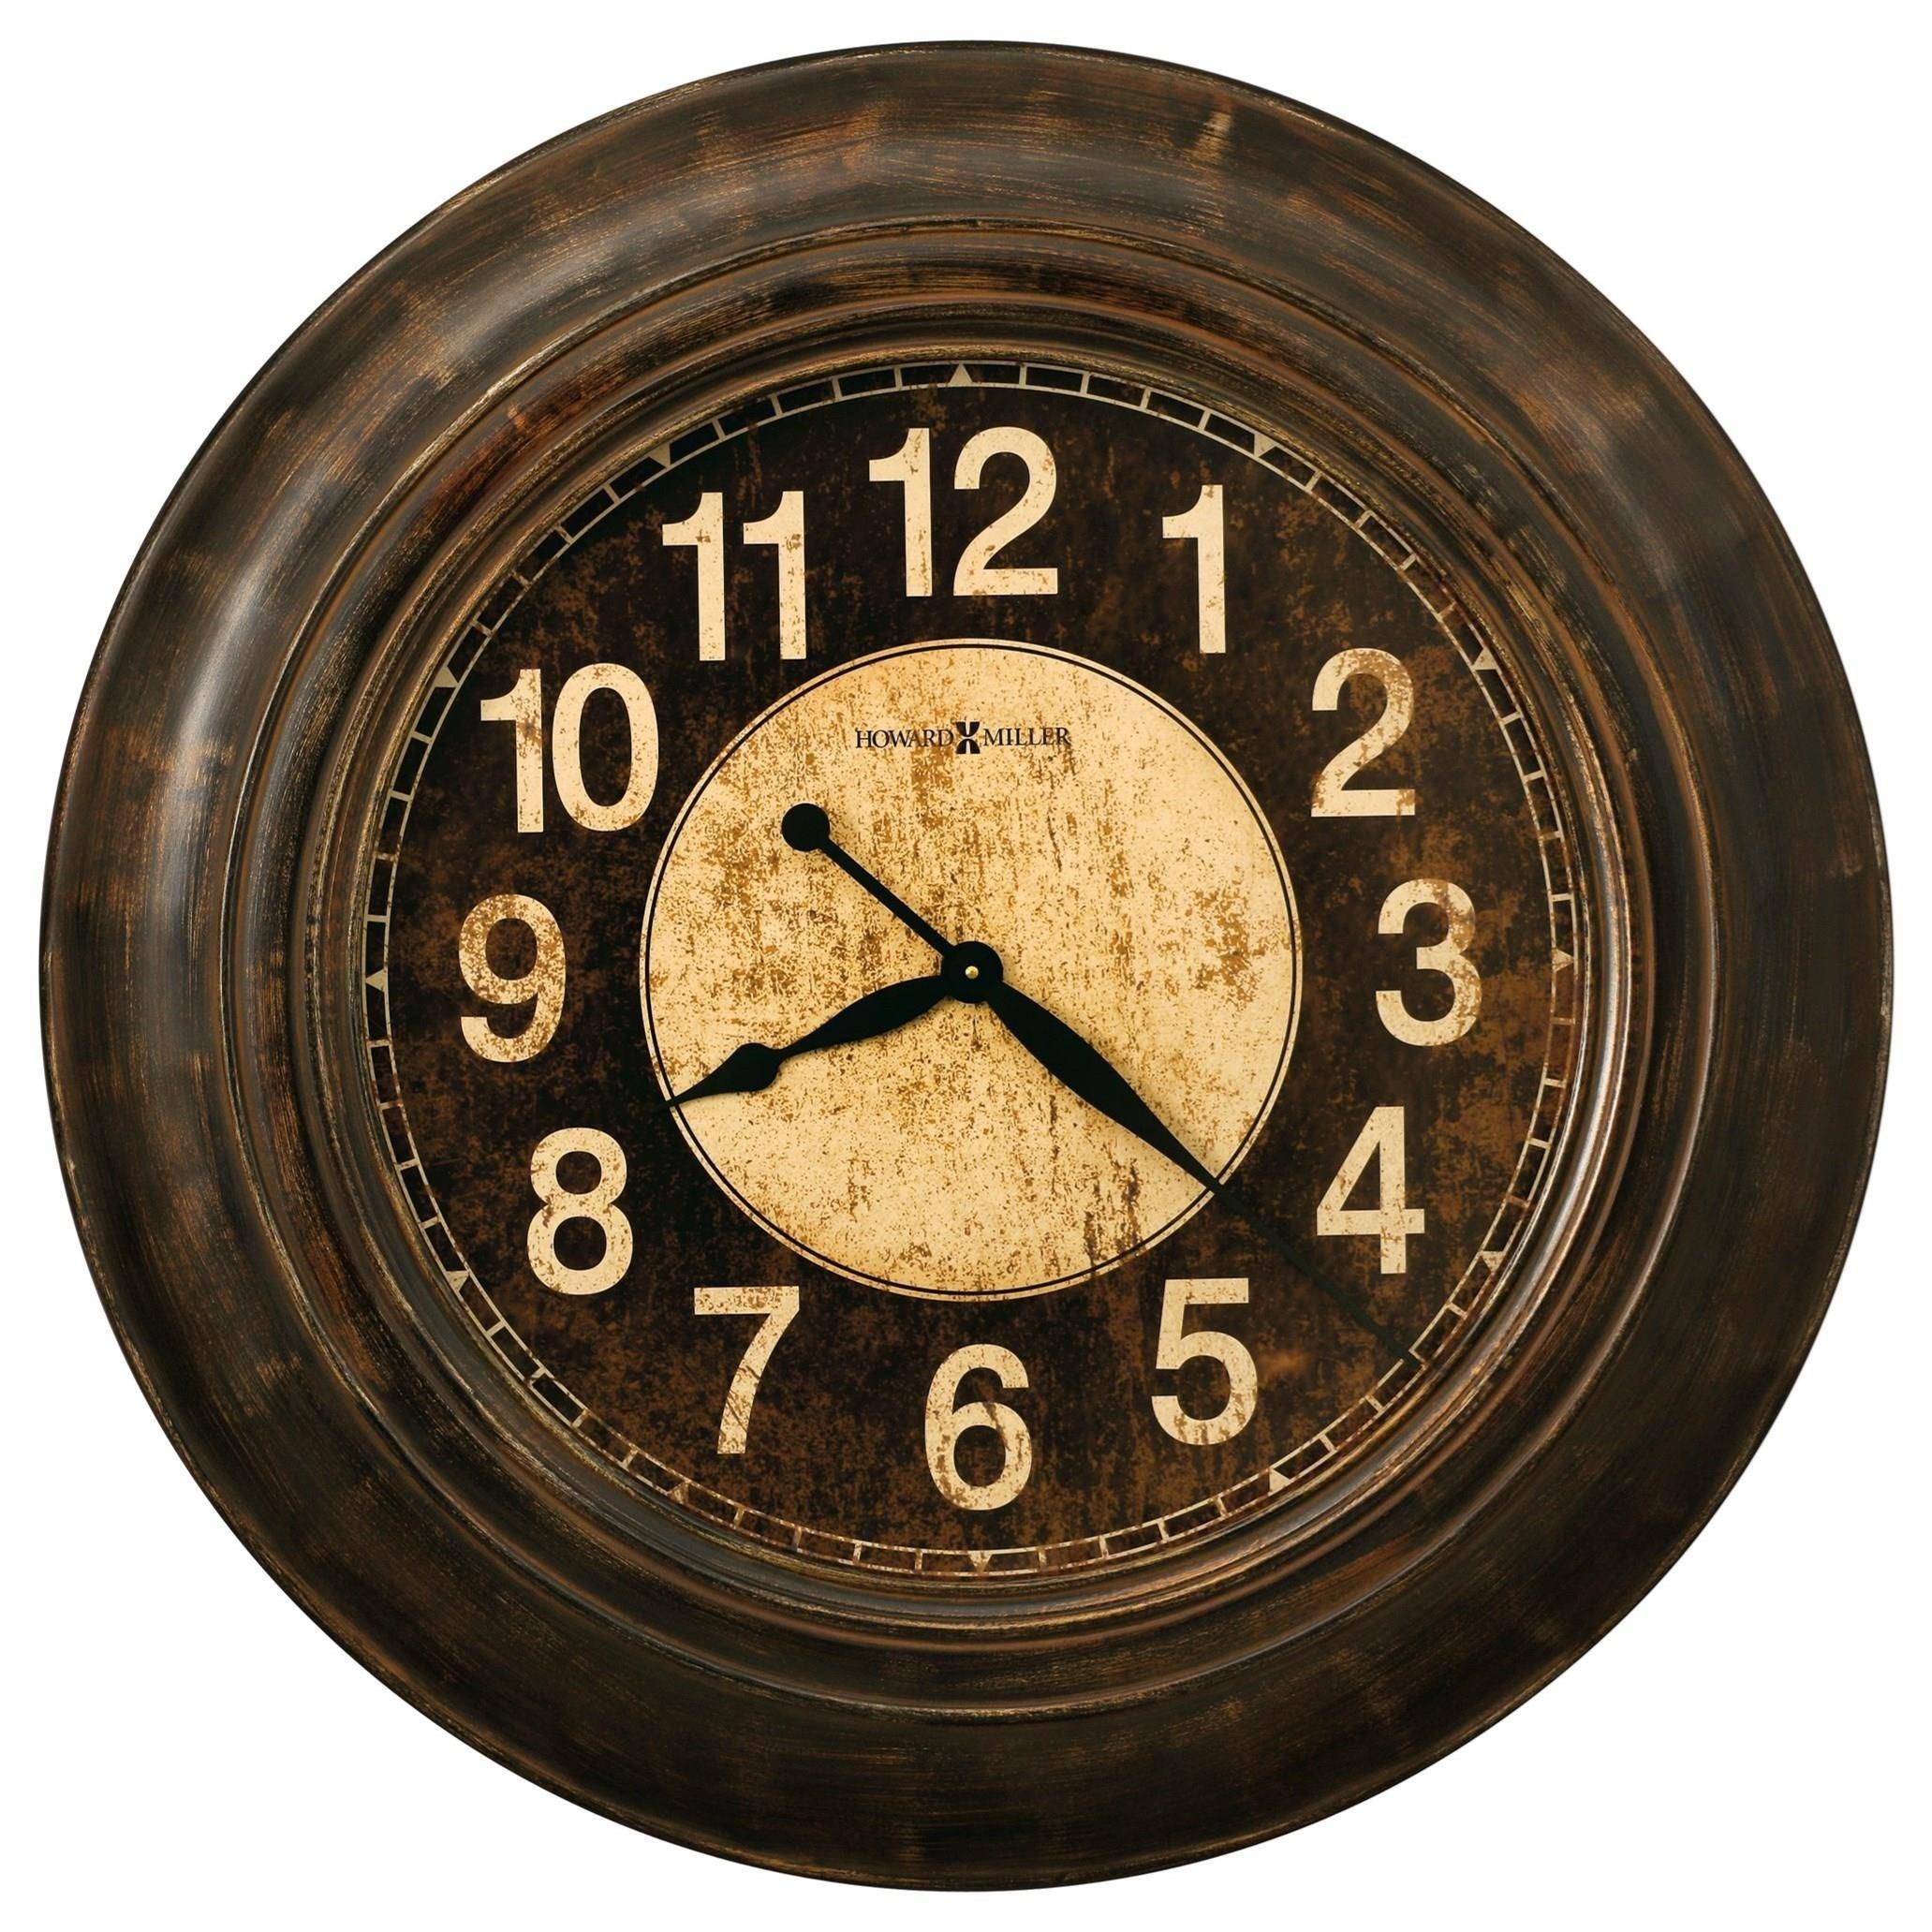 Wall Clocks Bozeman Round Wall Clock by Howard Miller at Esprit Decor Home Furnishings